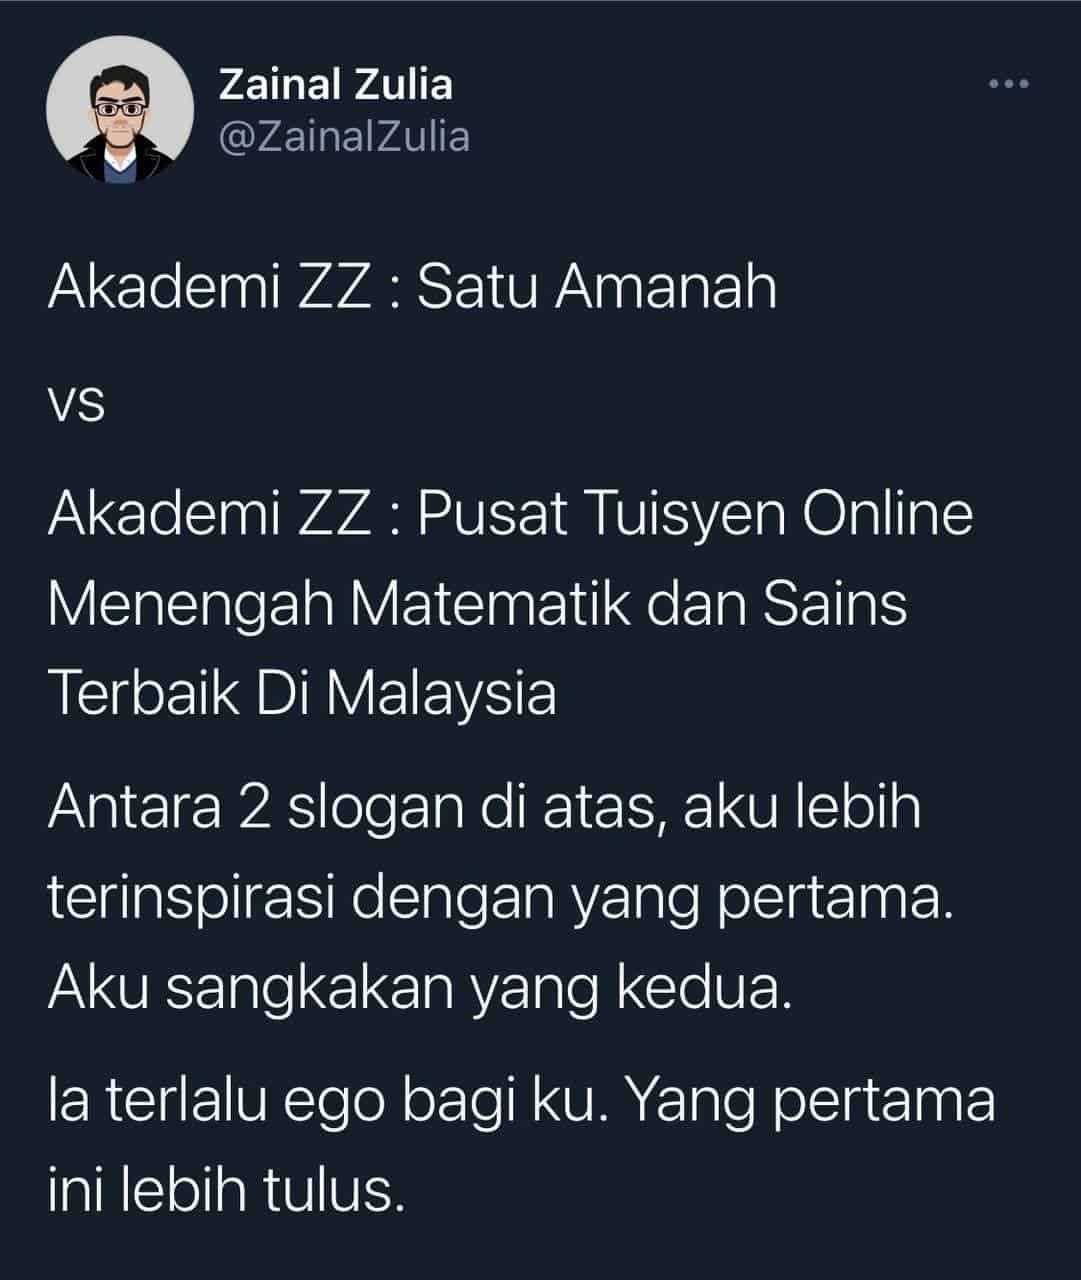 Akademi ZZ : Satu Amanah